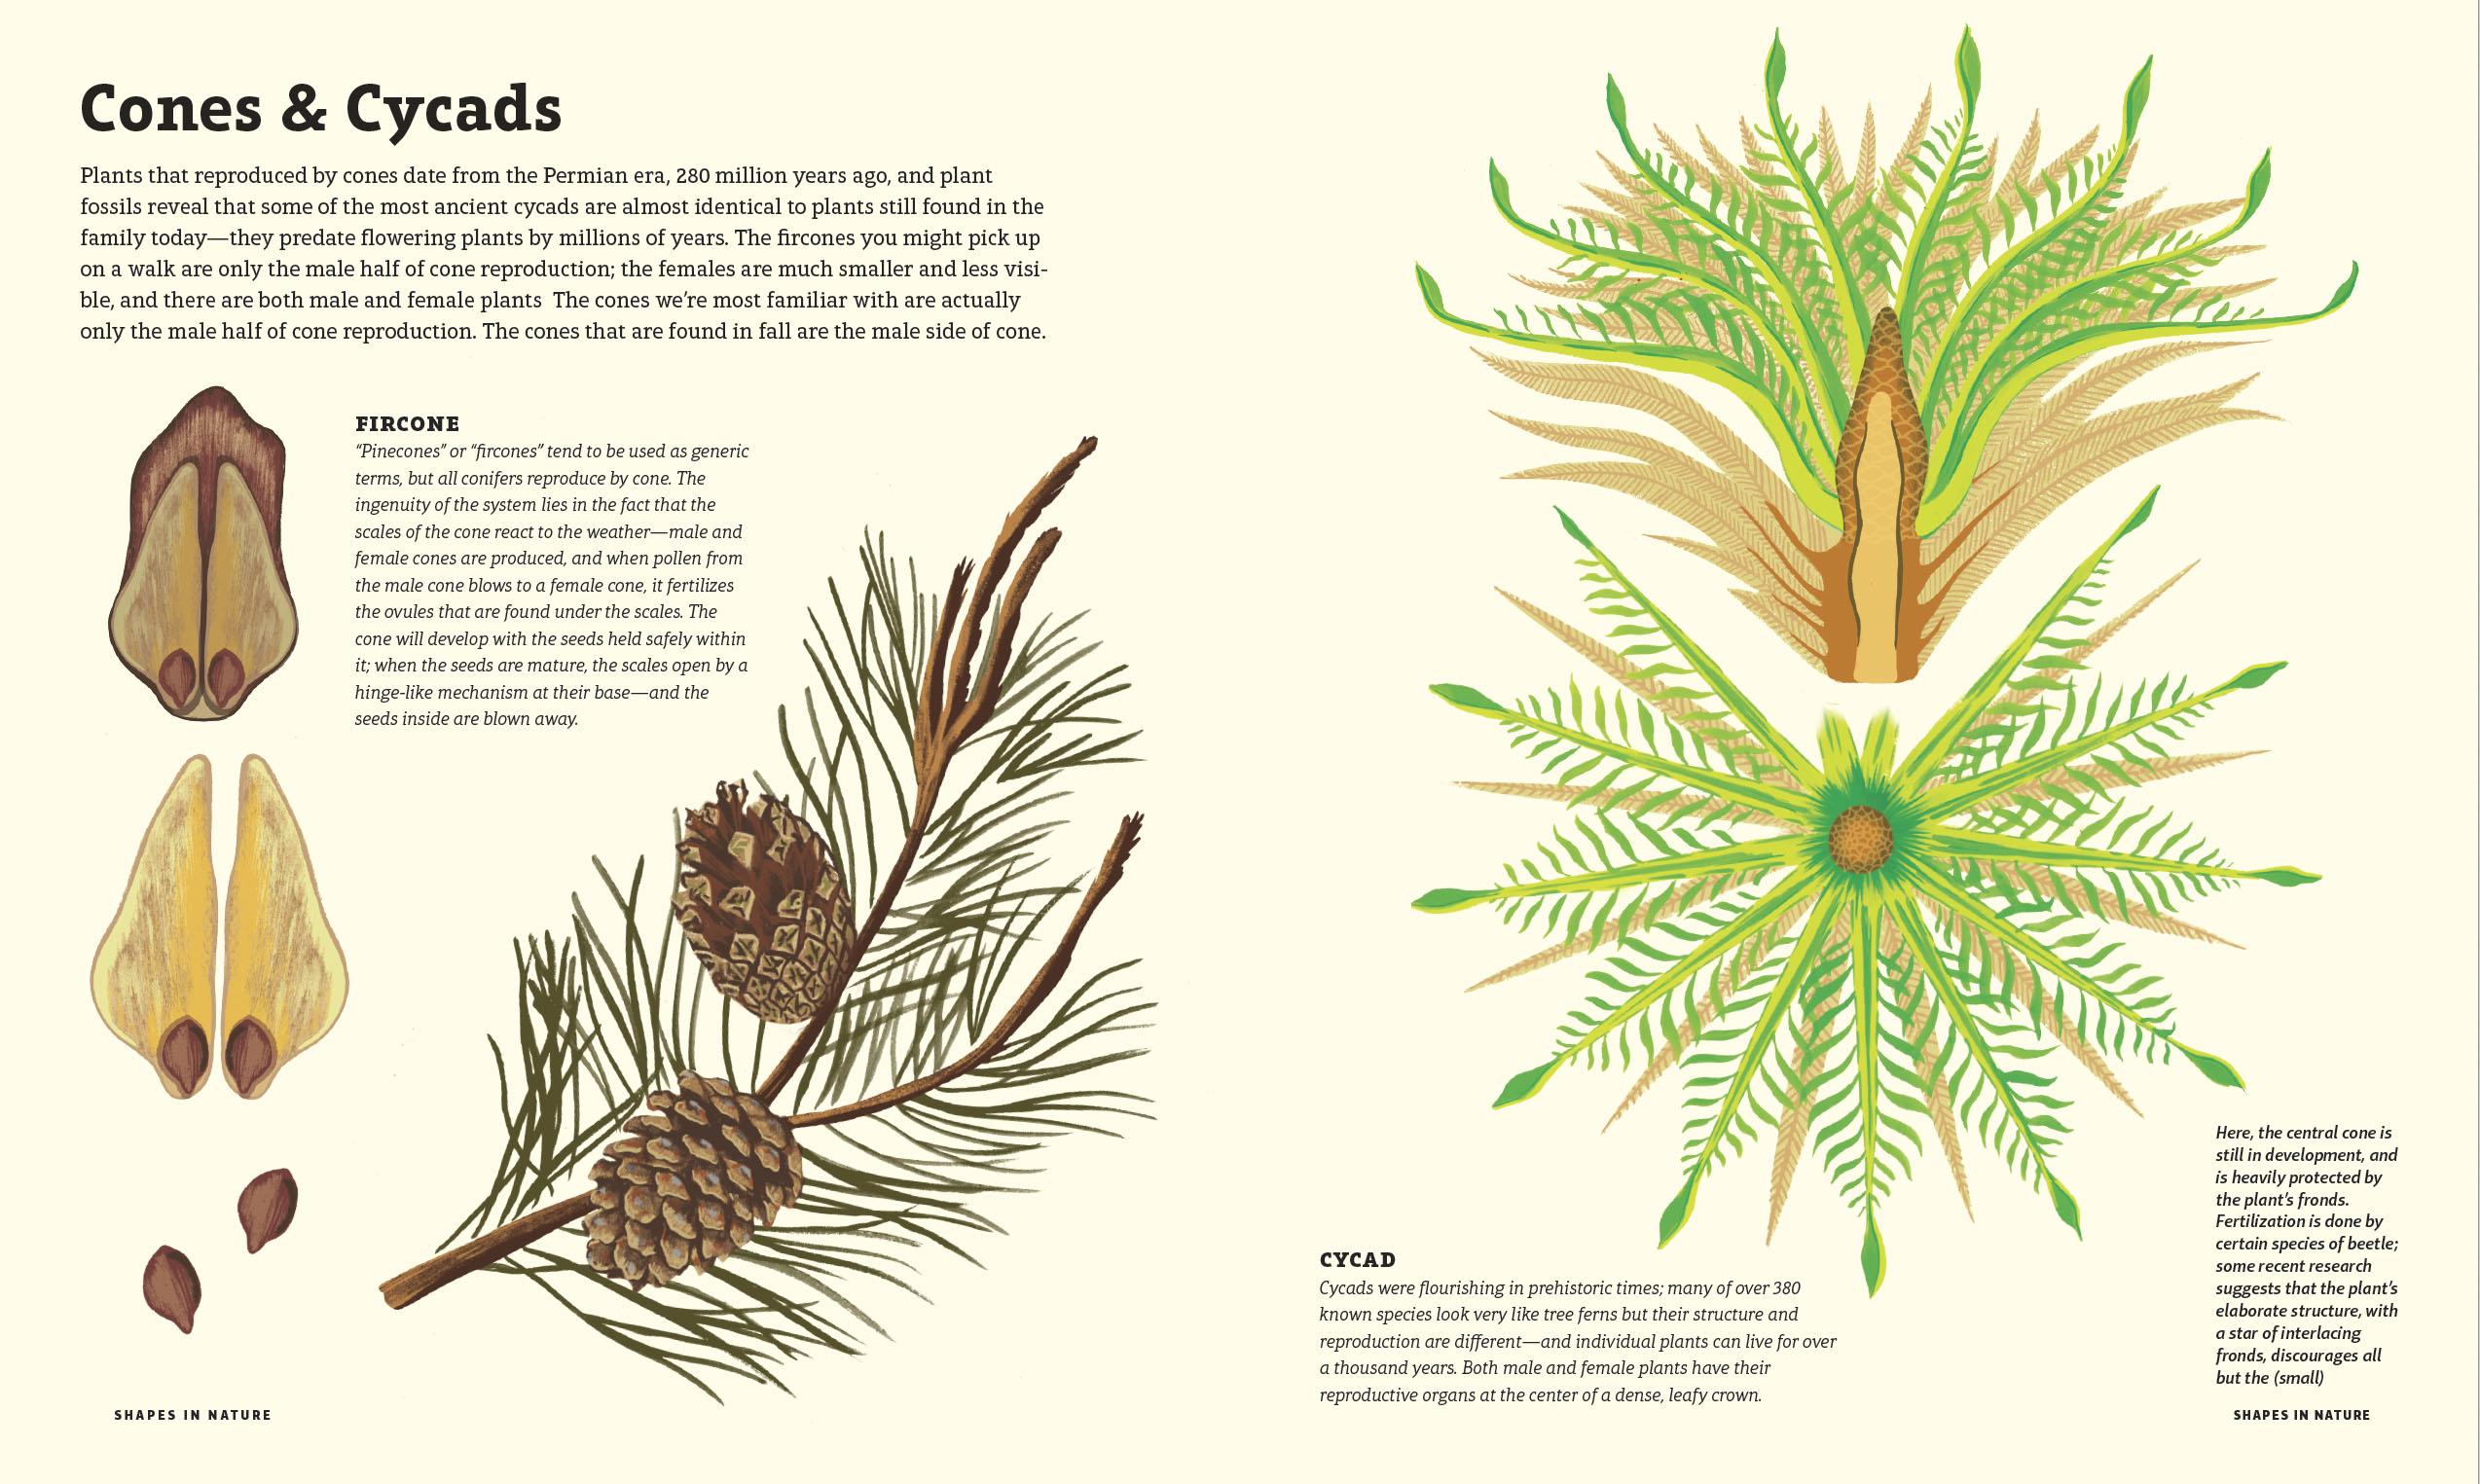 Cones & Cycads illustration